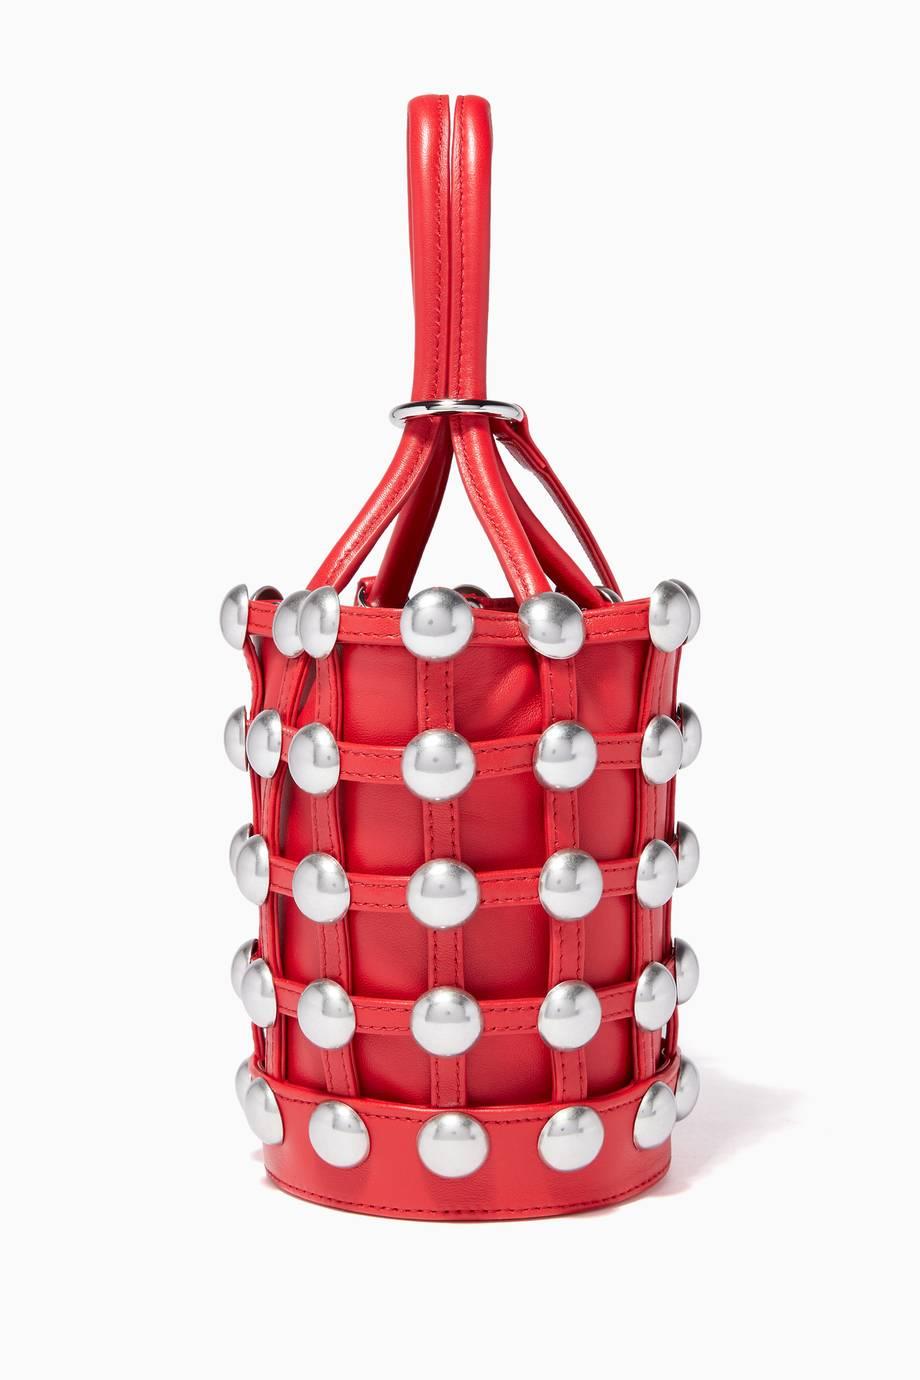 c09d55865338 Shop Luxury Alexander Wang Red Mini Roxy Bucket Bag